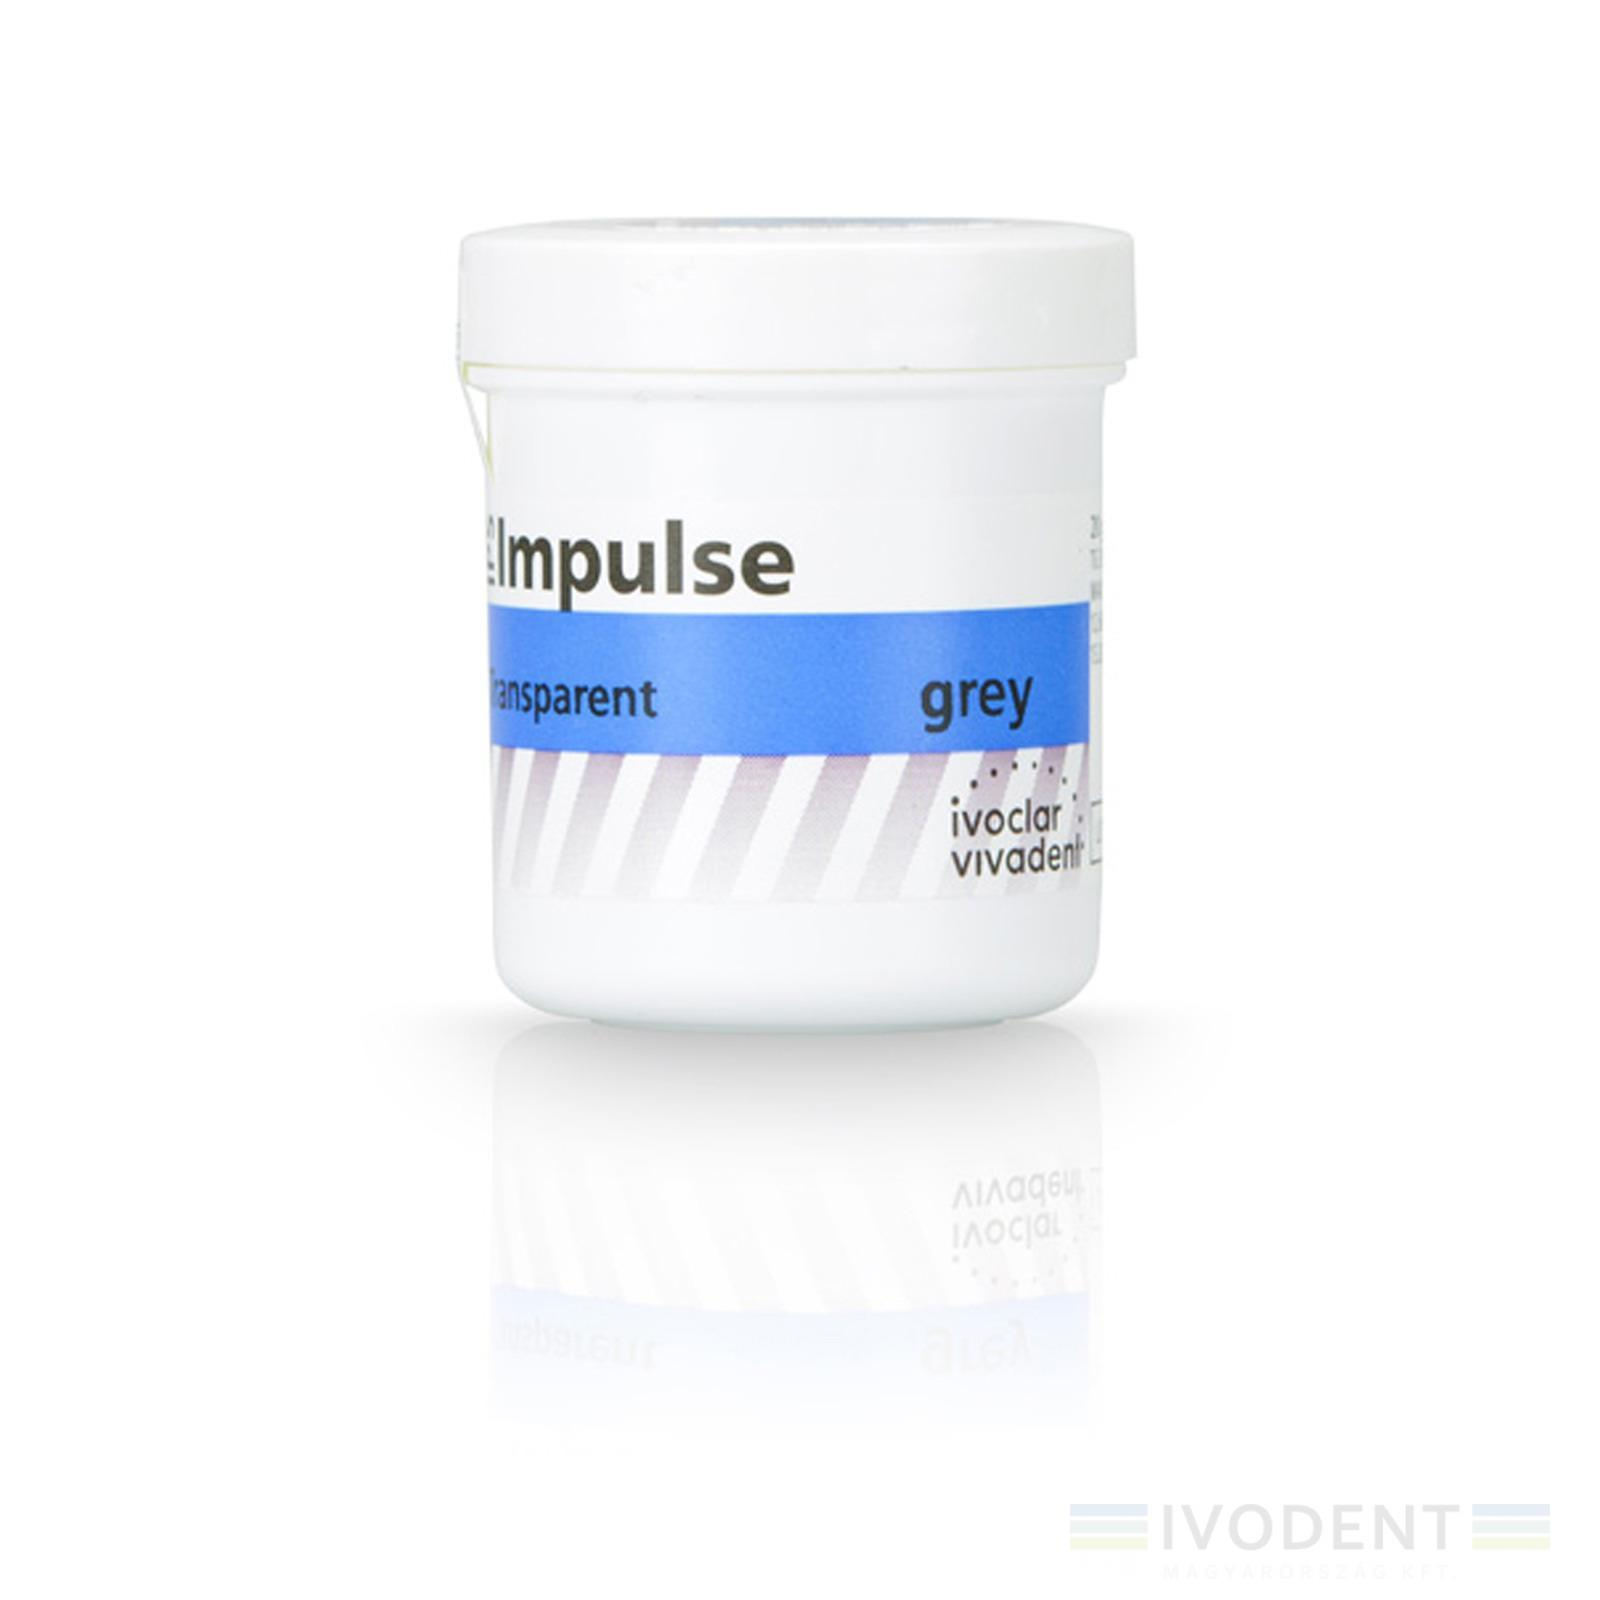 IPS Impulse Transparent 20 g grey